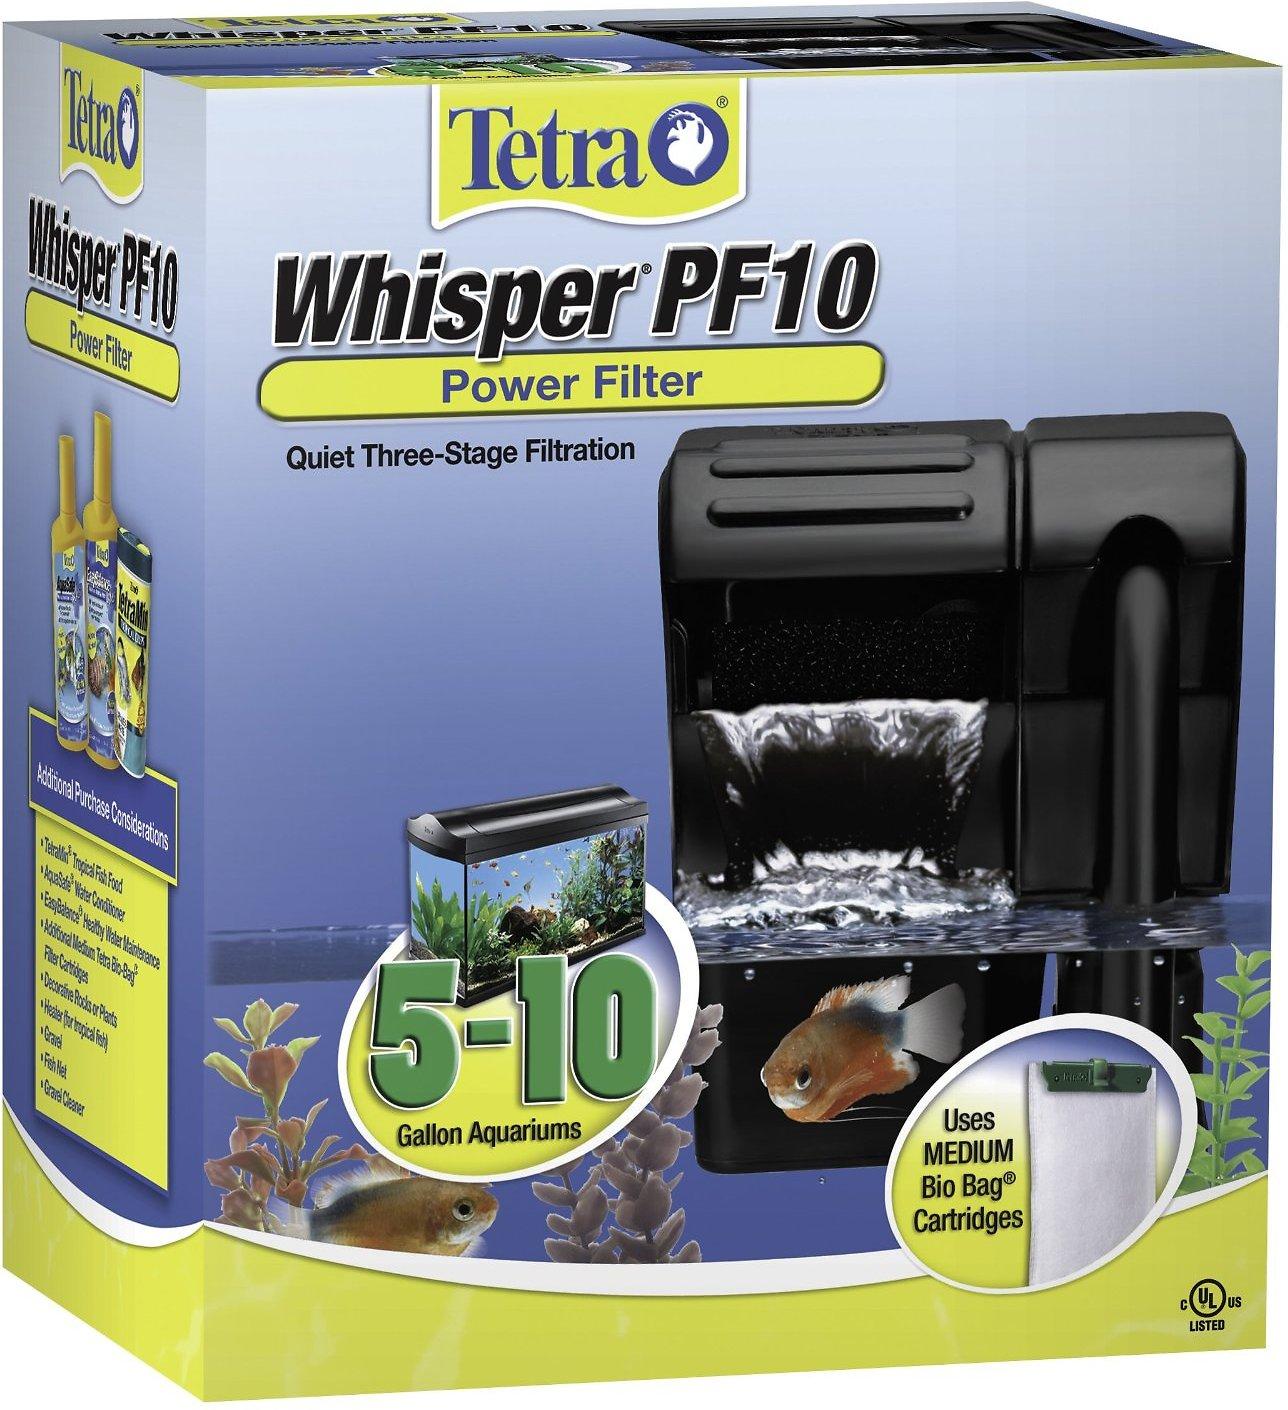 Tetra Whisper Power Filter, 5 - 10 gal